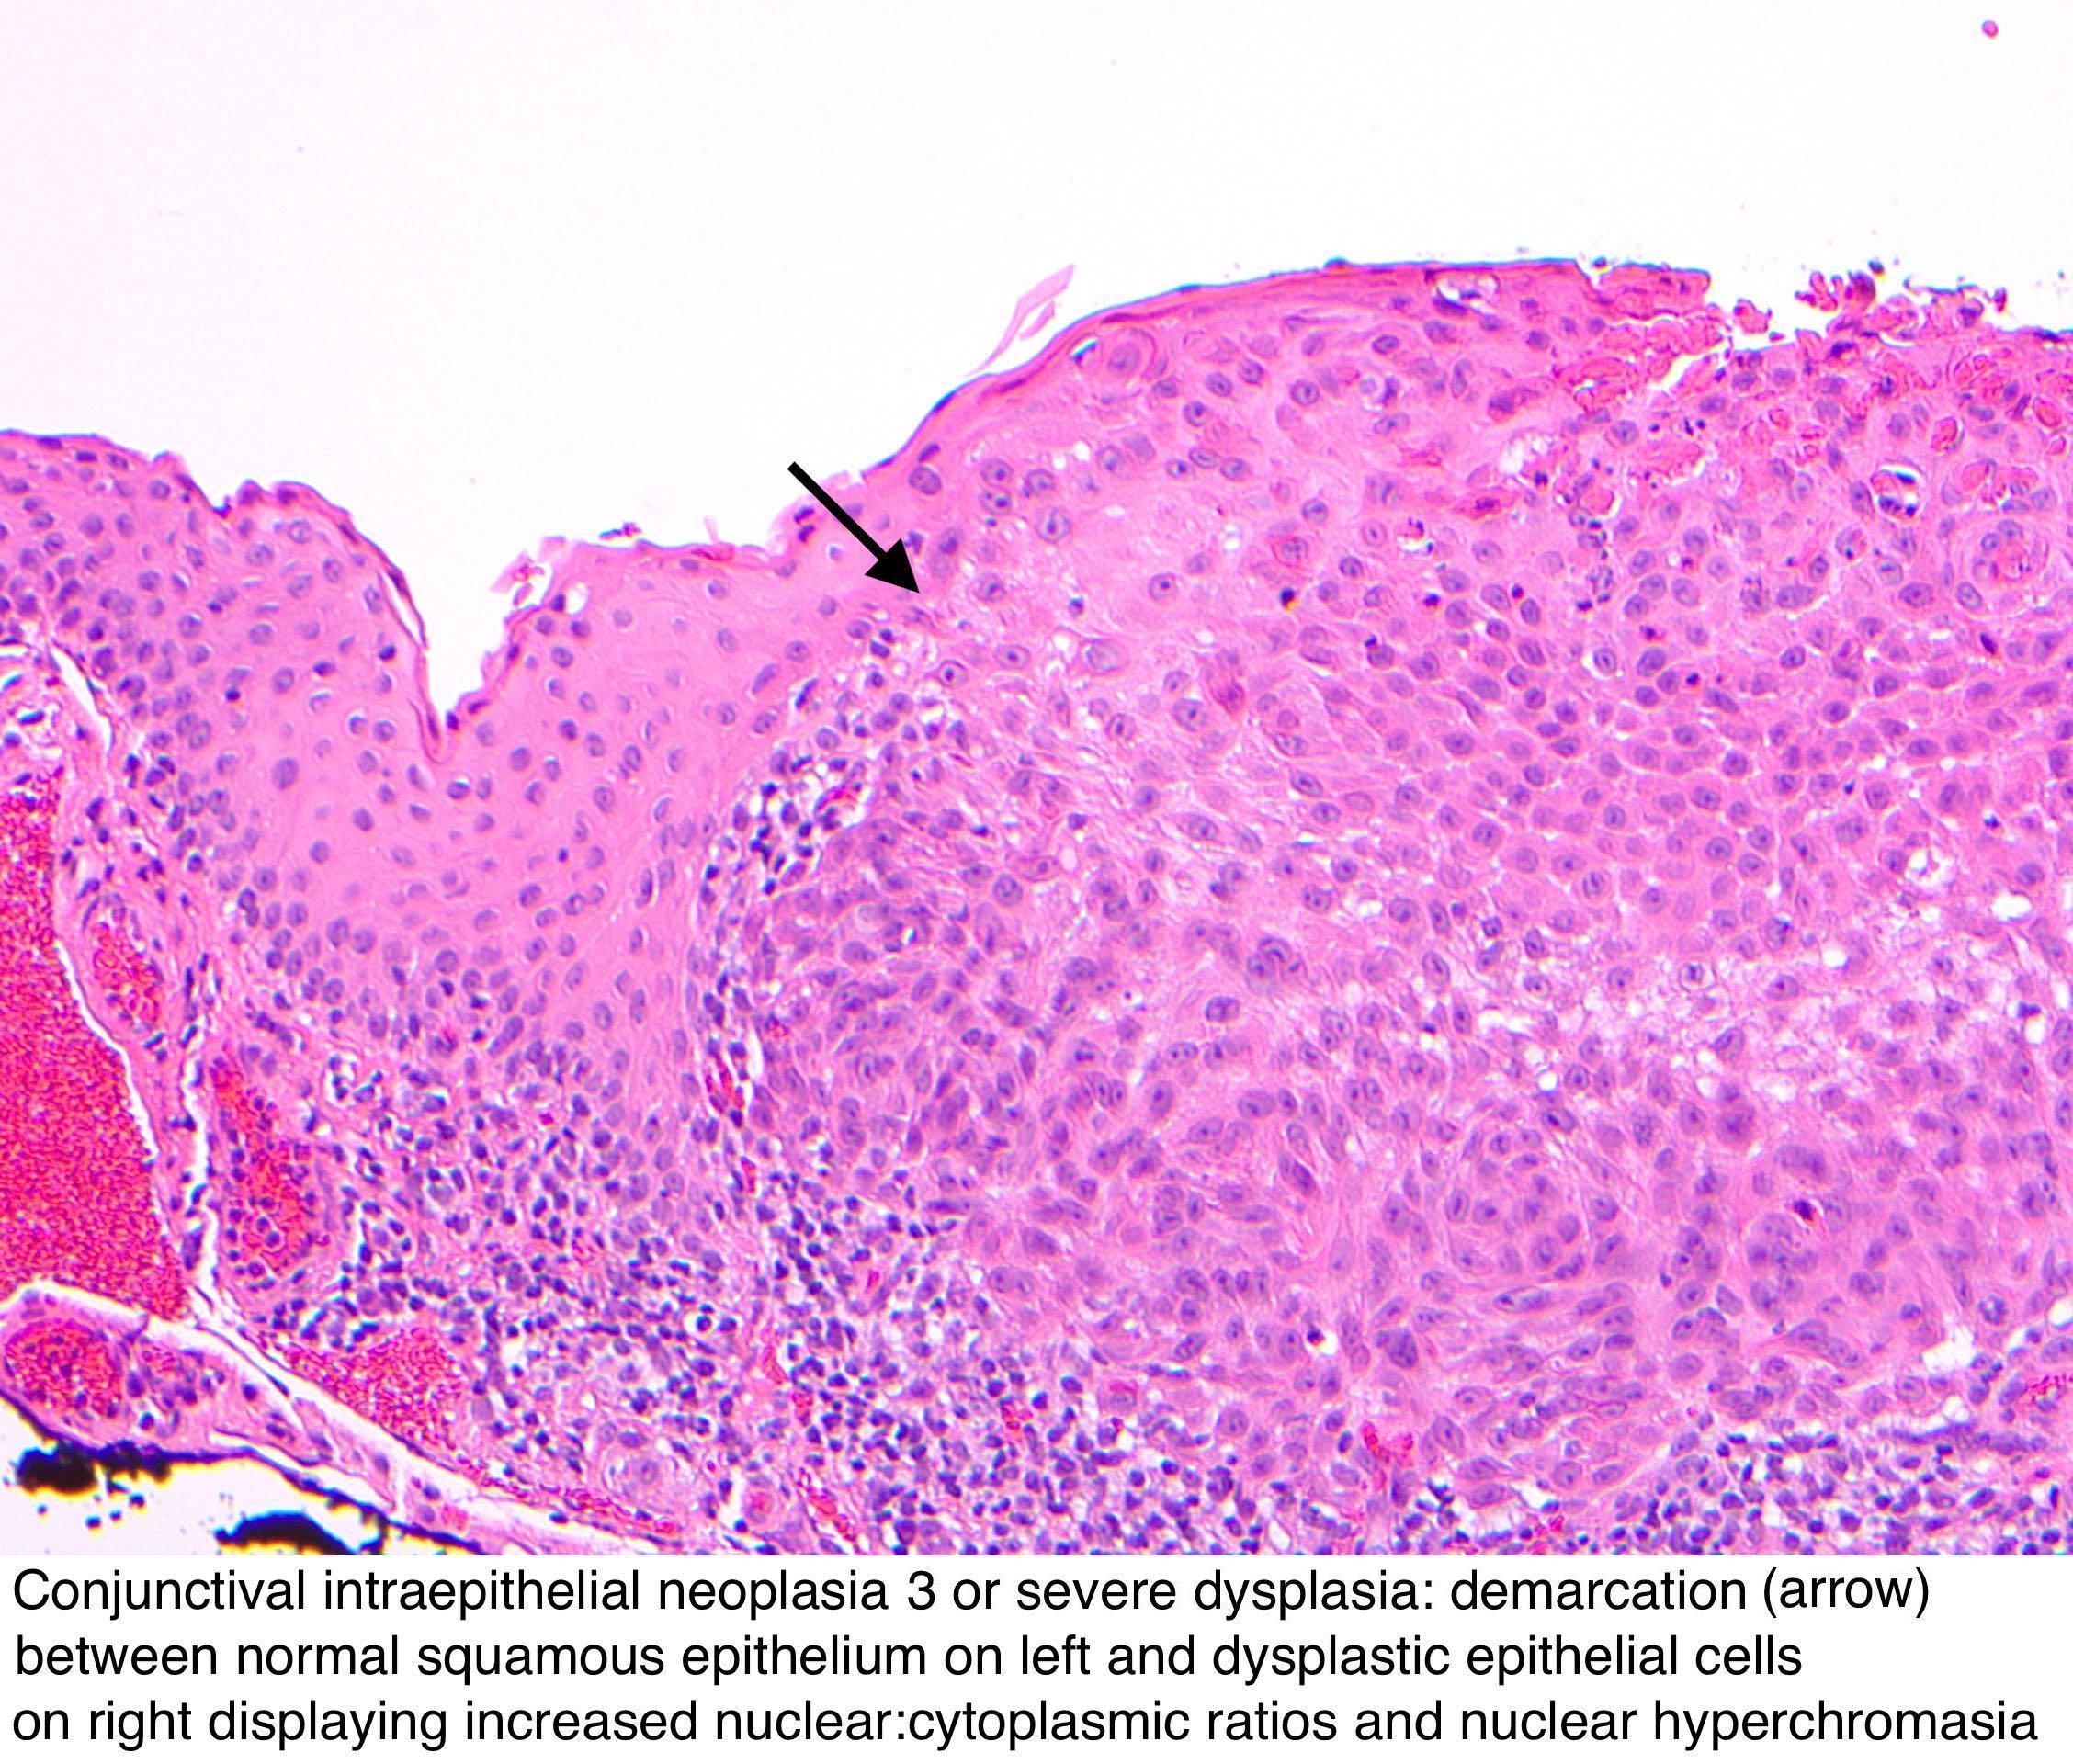 Squamous papilloma with dysplasia., Squamous papilloma dysplasia